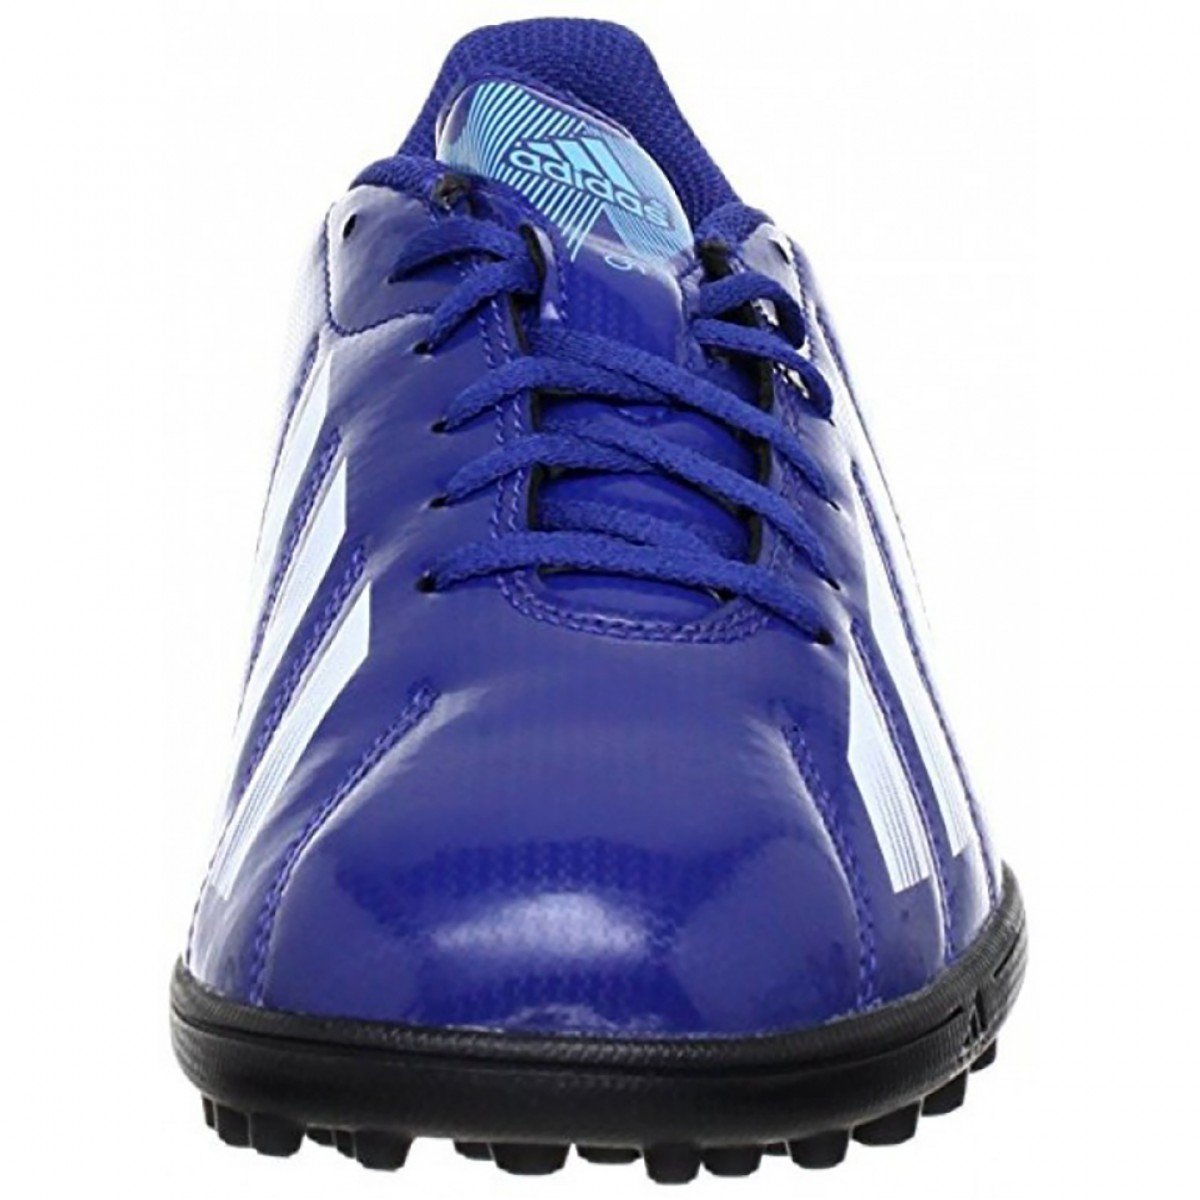 7a2f9dc398 Chuteira Society Adidas F5 TRX TF Masculina Roxa - Compre Agora ...